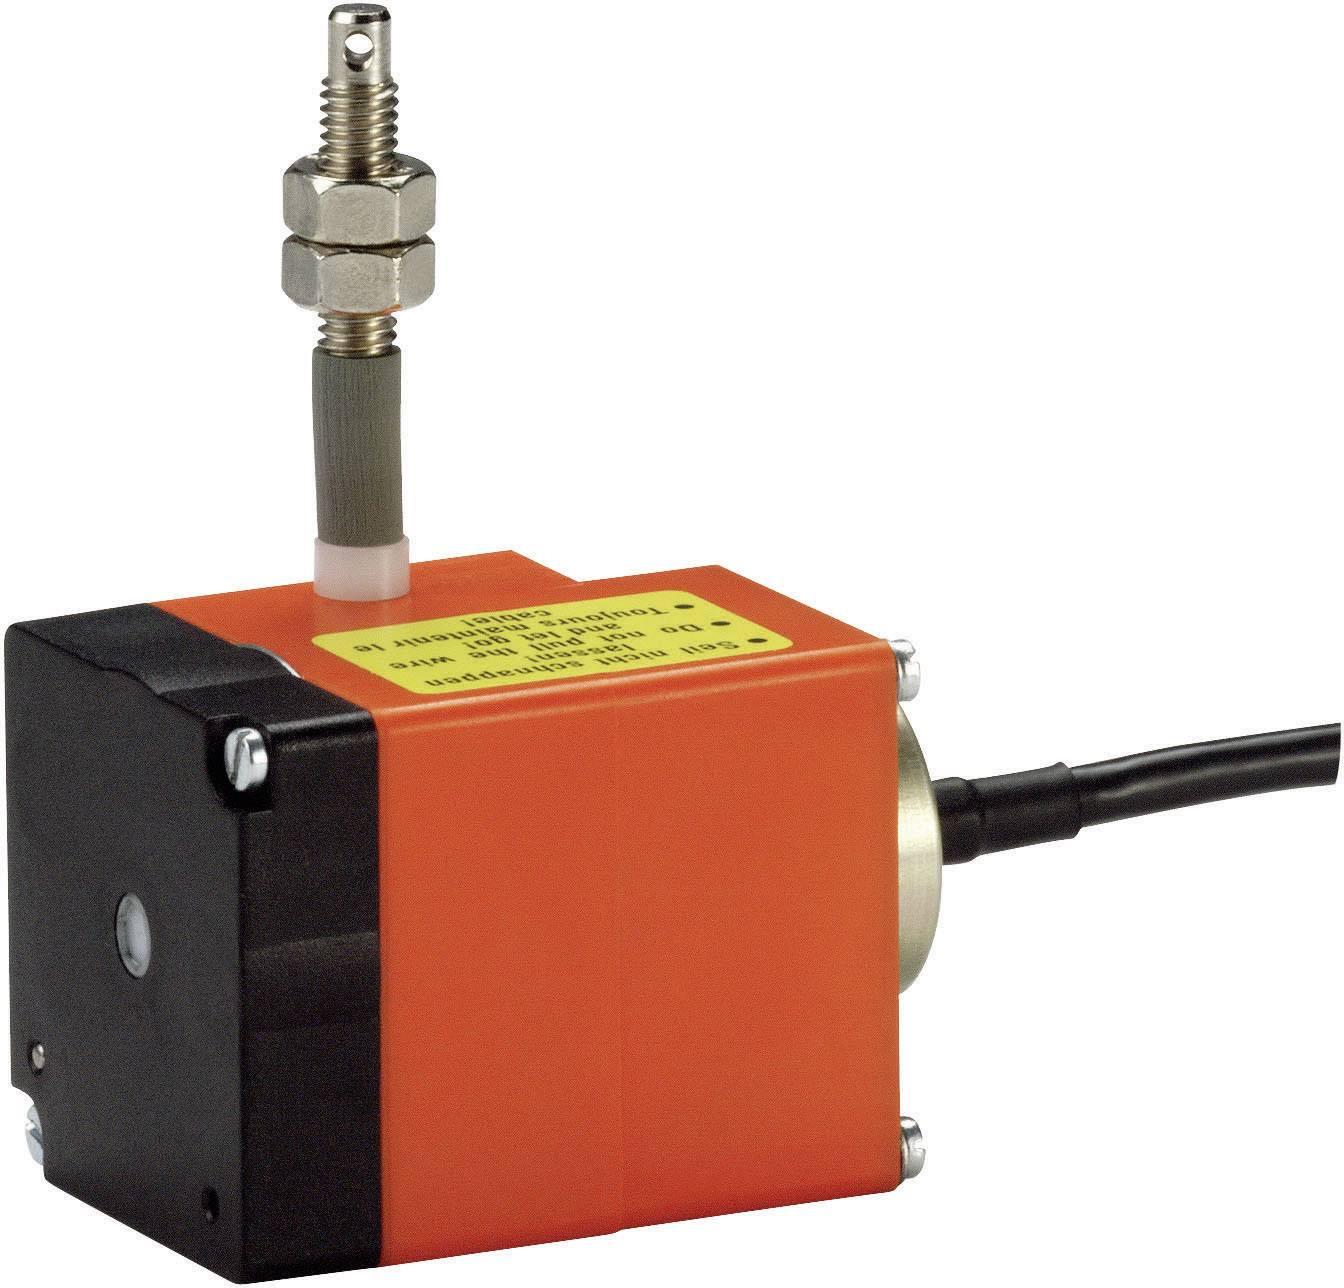 Mini ovládaný snímač Kübler D5, 4 - 20 mA